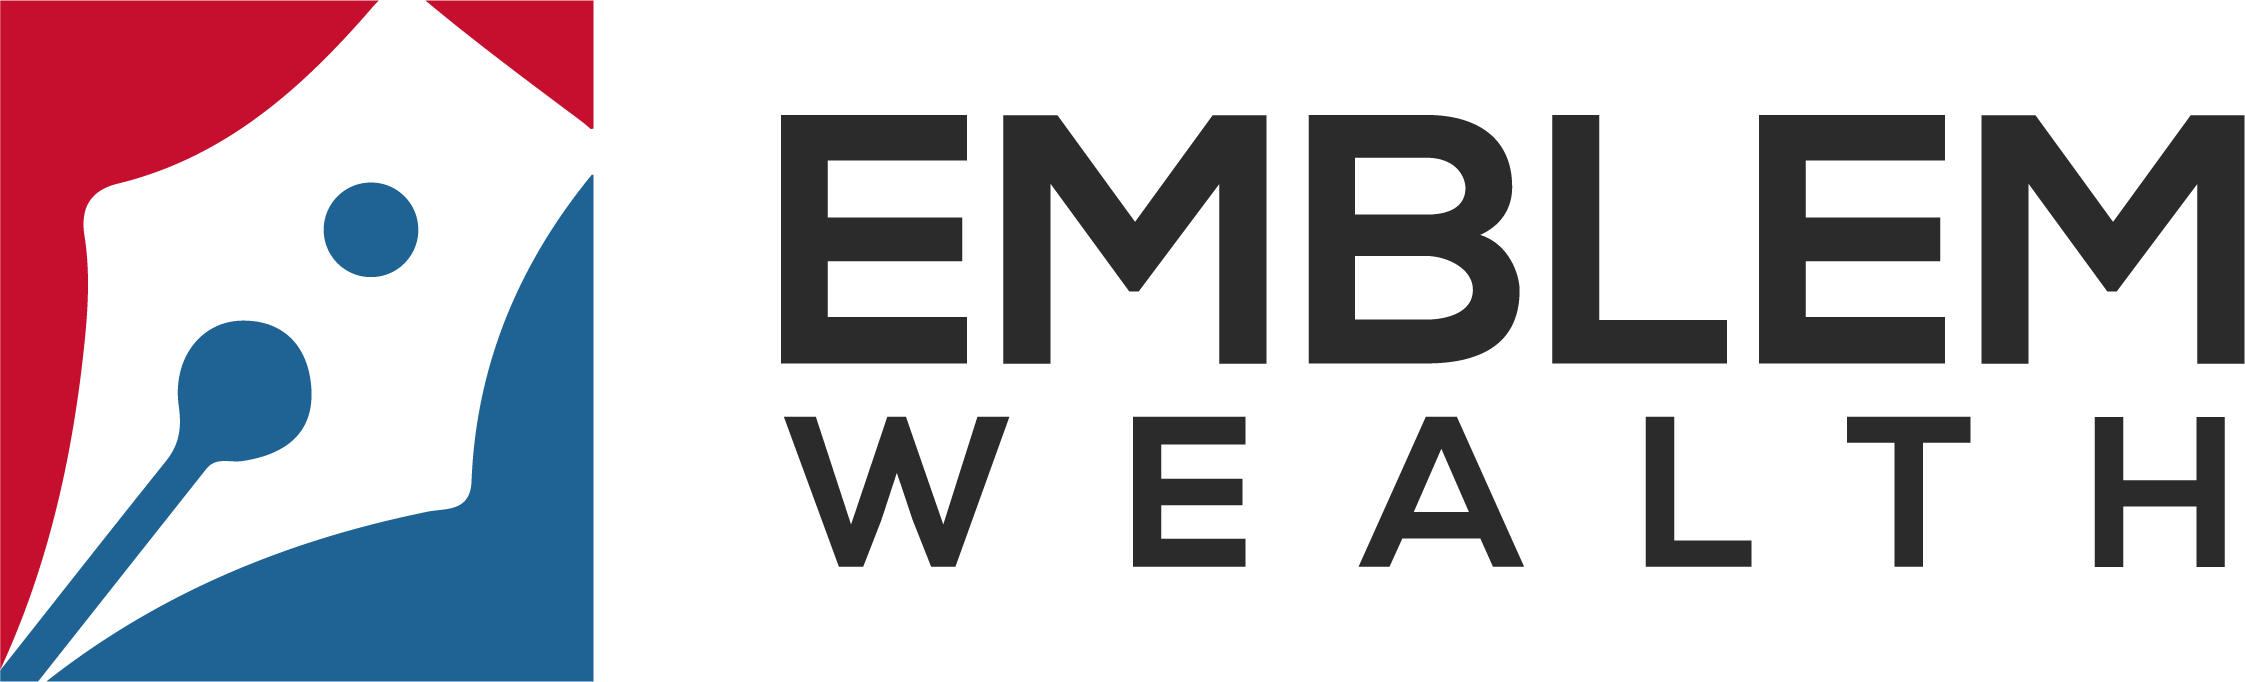 Emblem Wealth